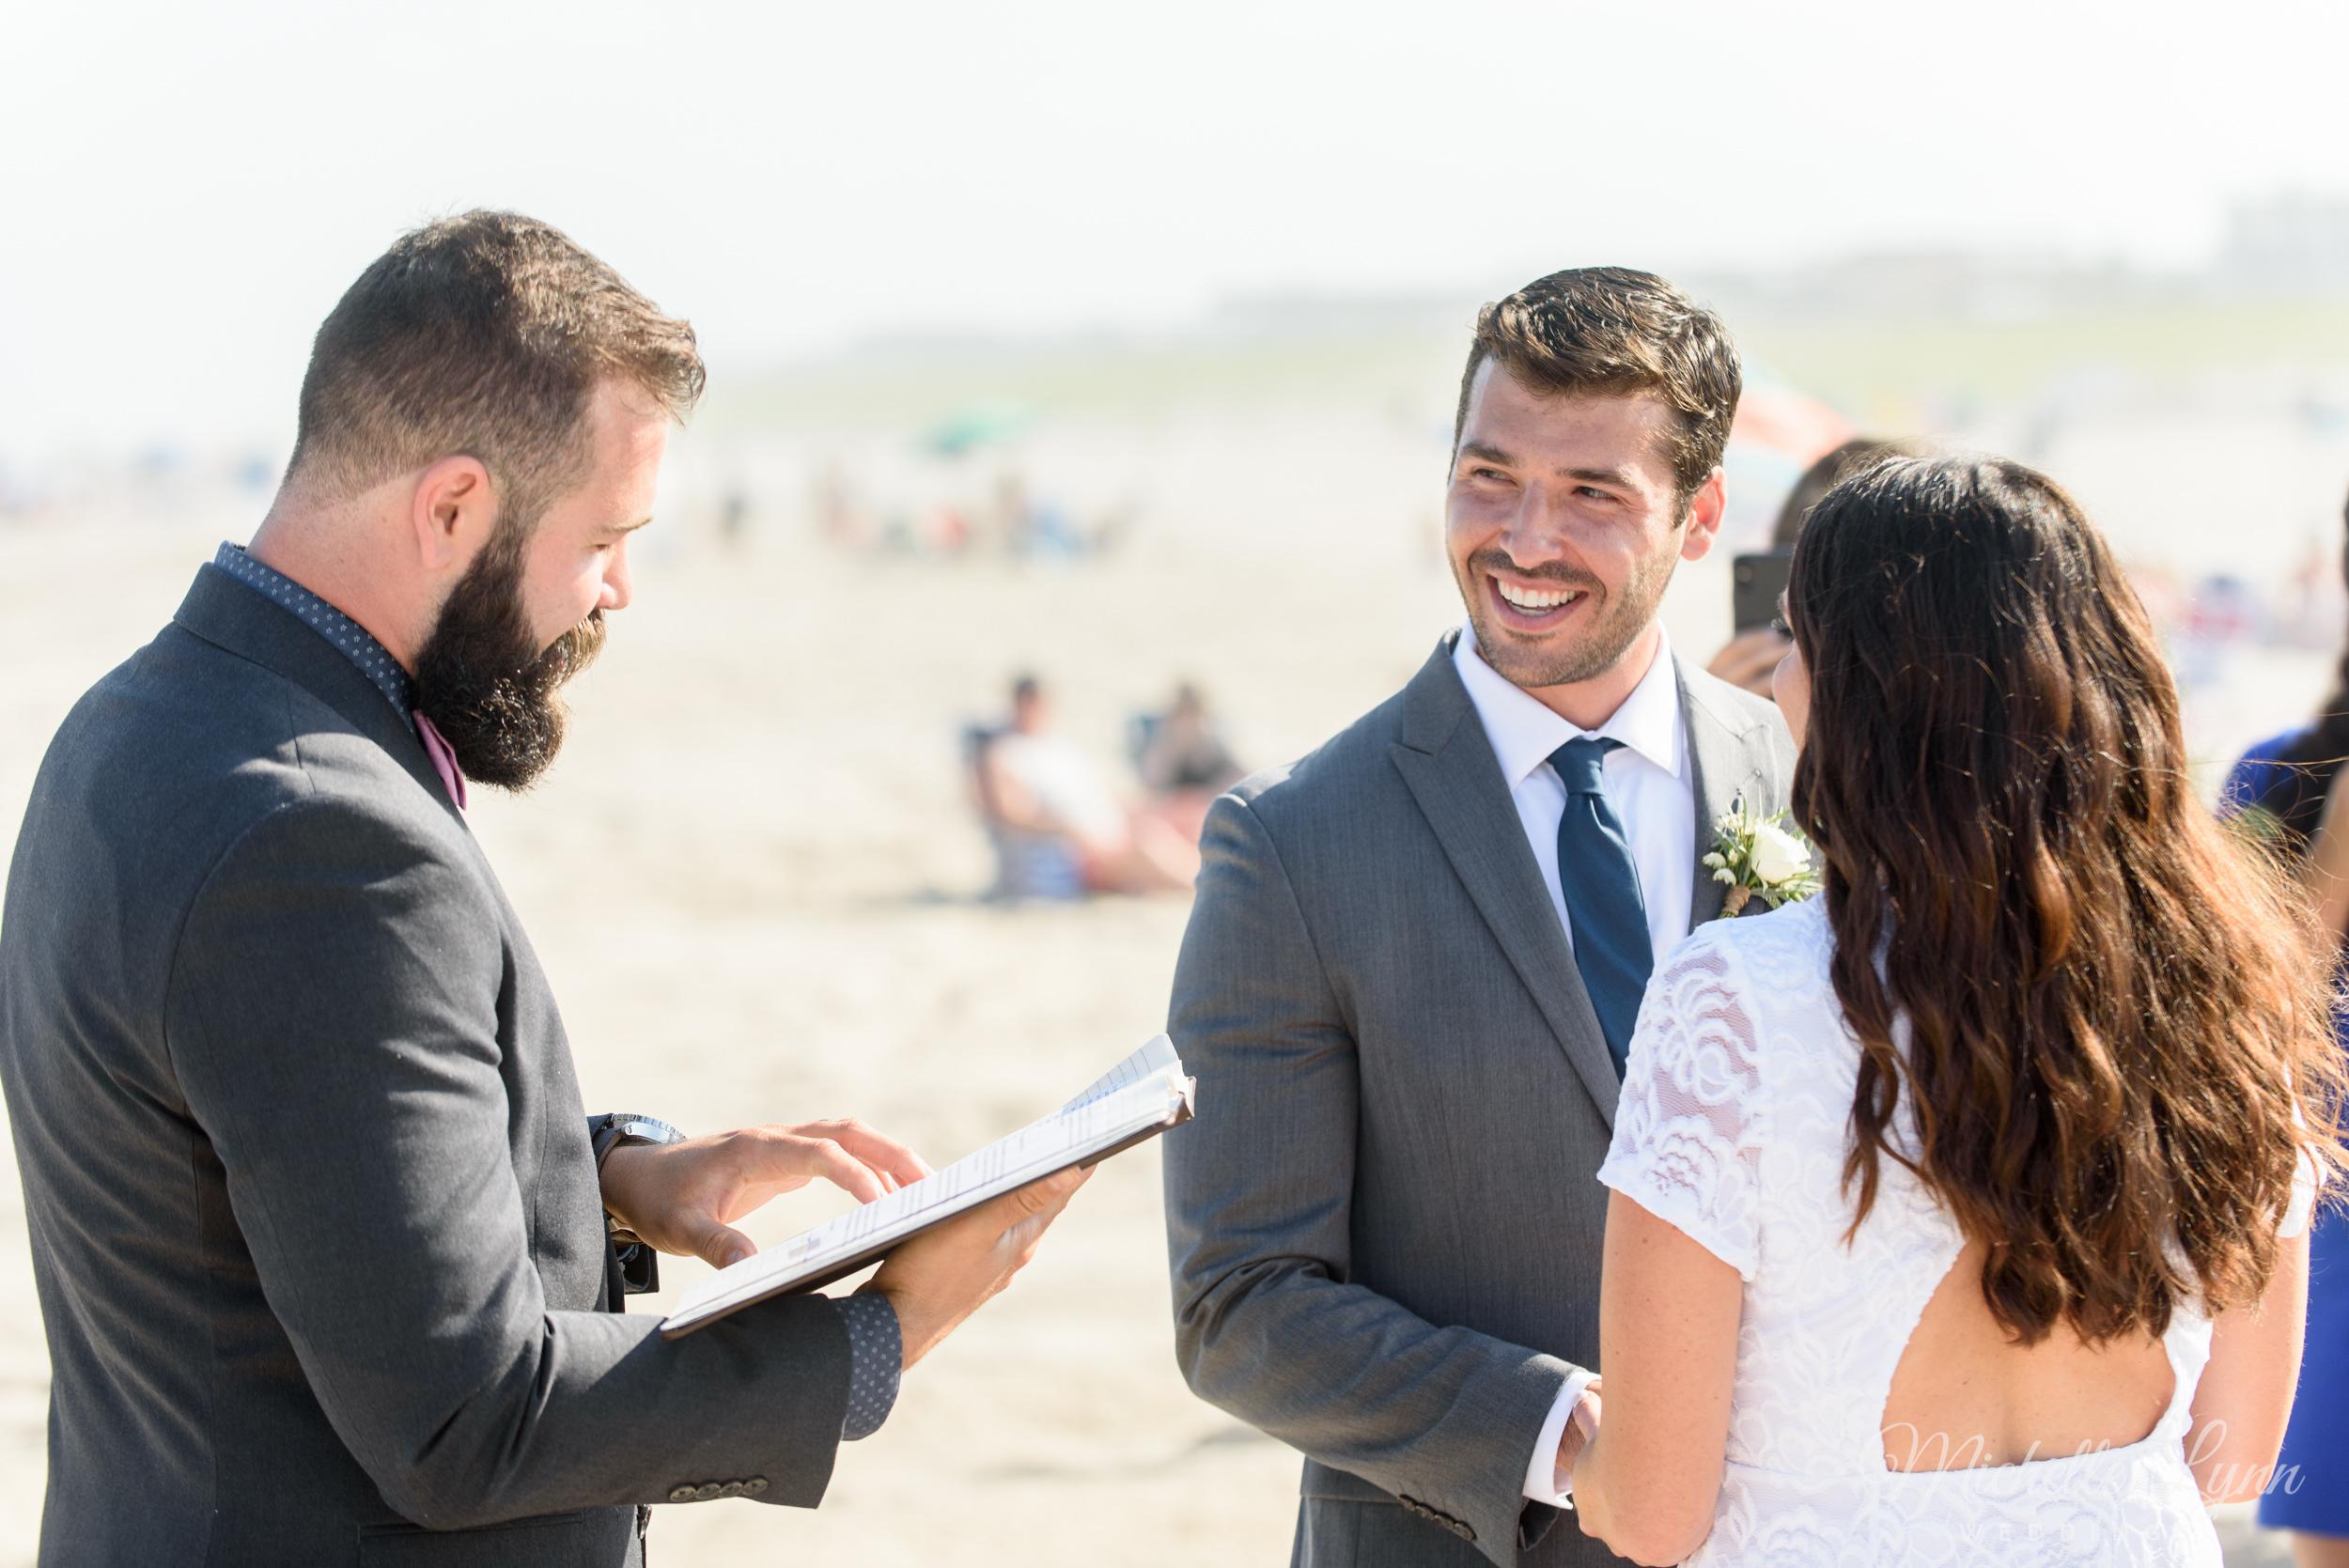 mlw-brant-beach-lbi-wedding-photography-22.jpg